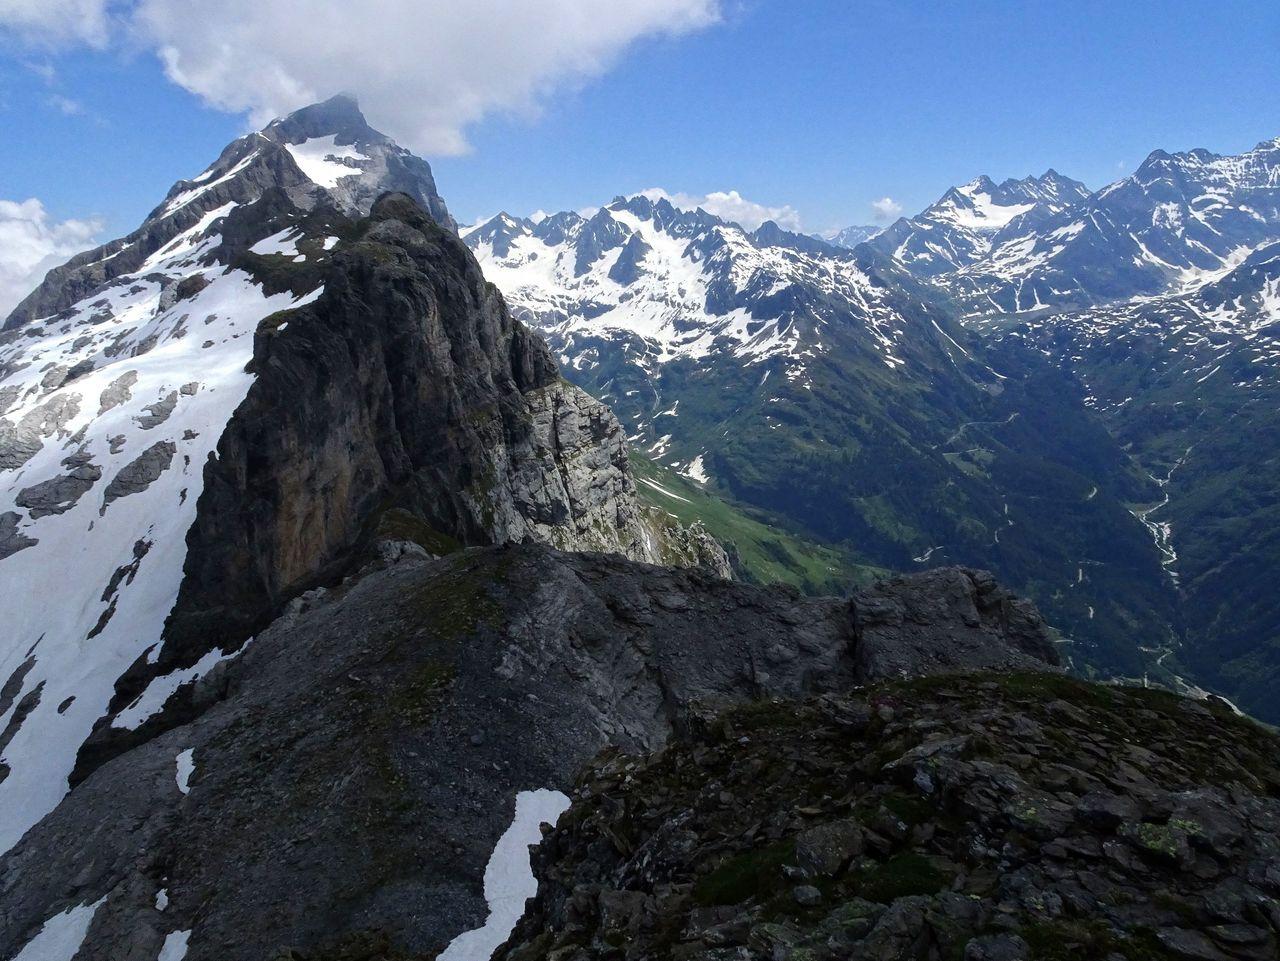 Klettersteig Tälli : Gadmerflue ausstieg tällistock klettersteig klettersteige